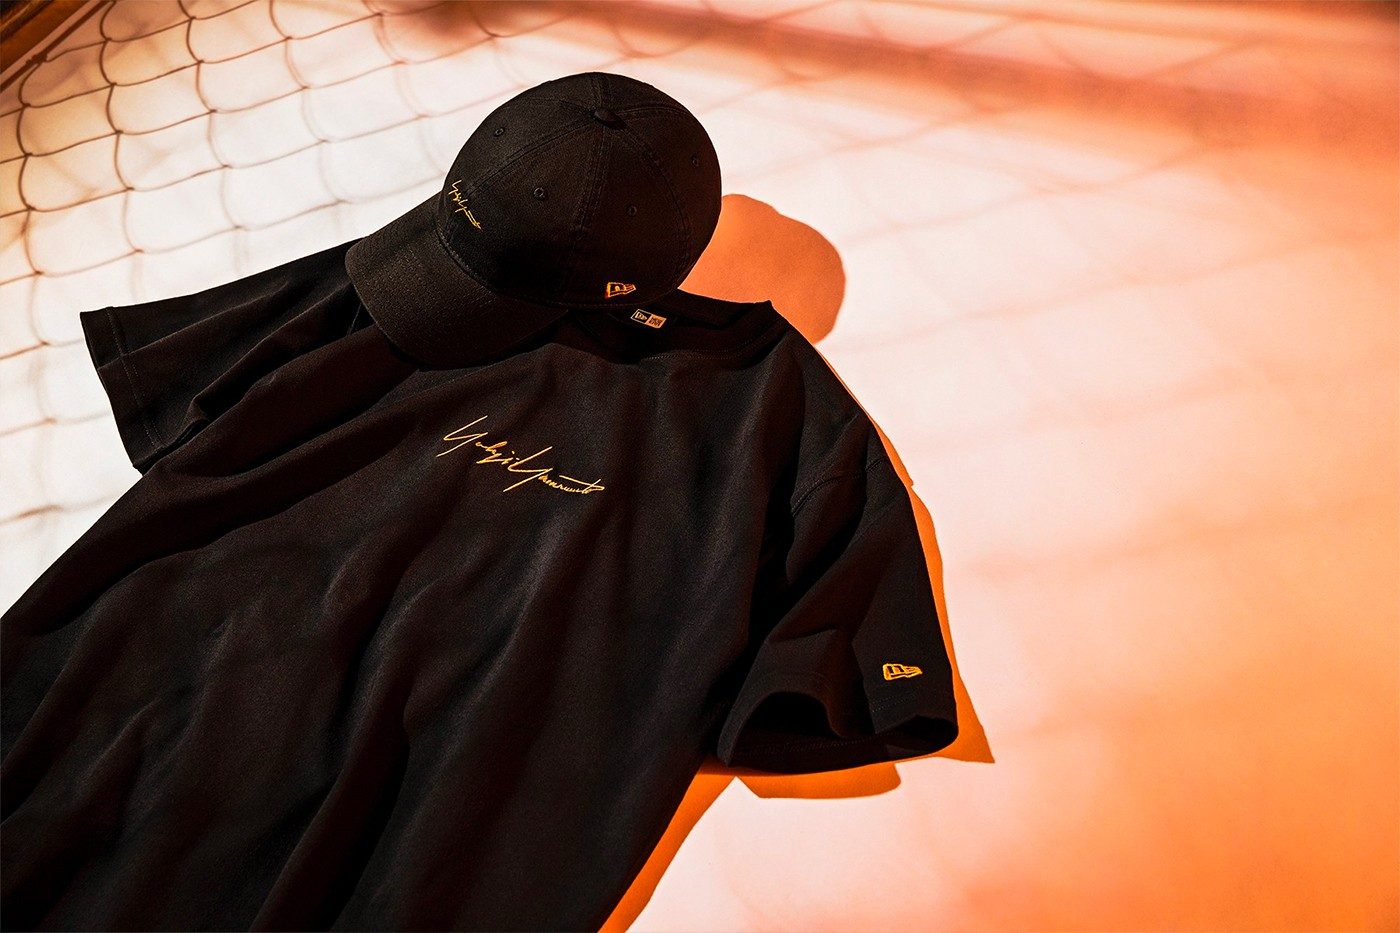 Supreme x Air Jordan 14 及 Louis Vuitton 首飾系列等本週不容錯過的 8 項新品發售